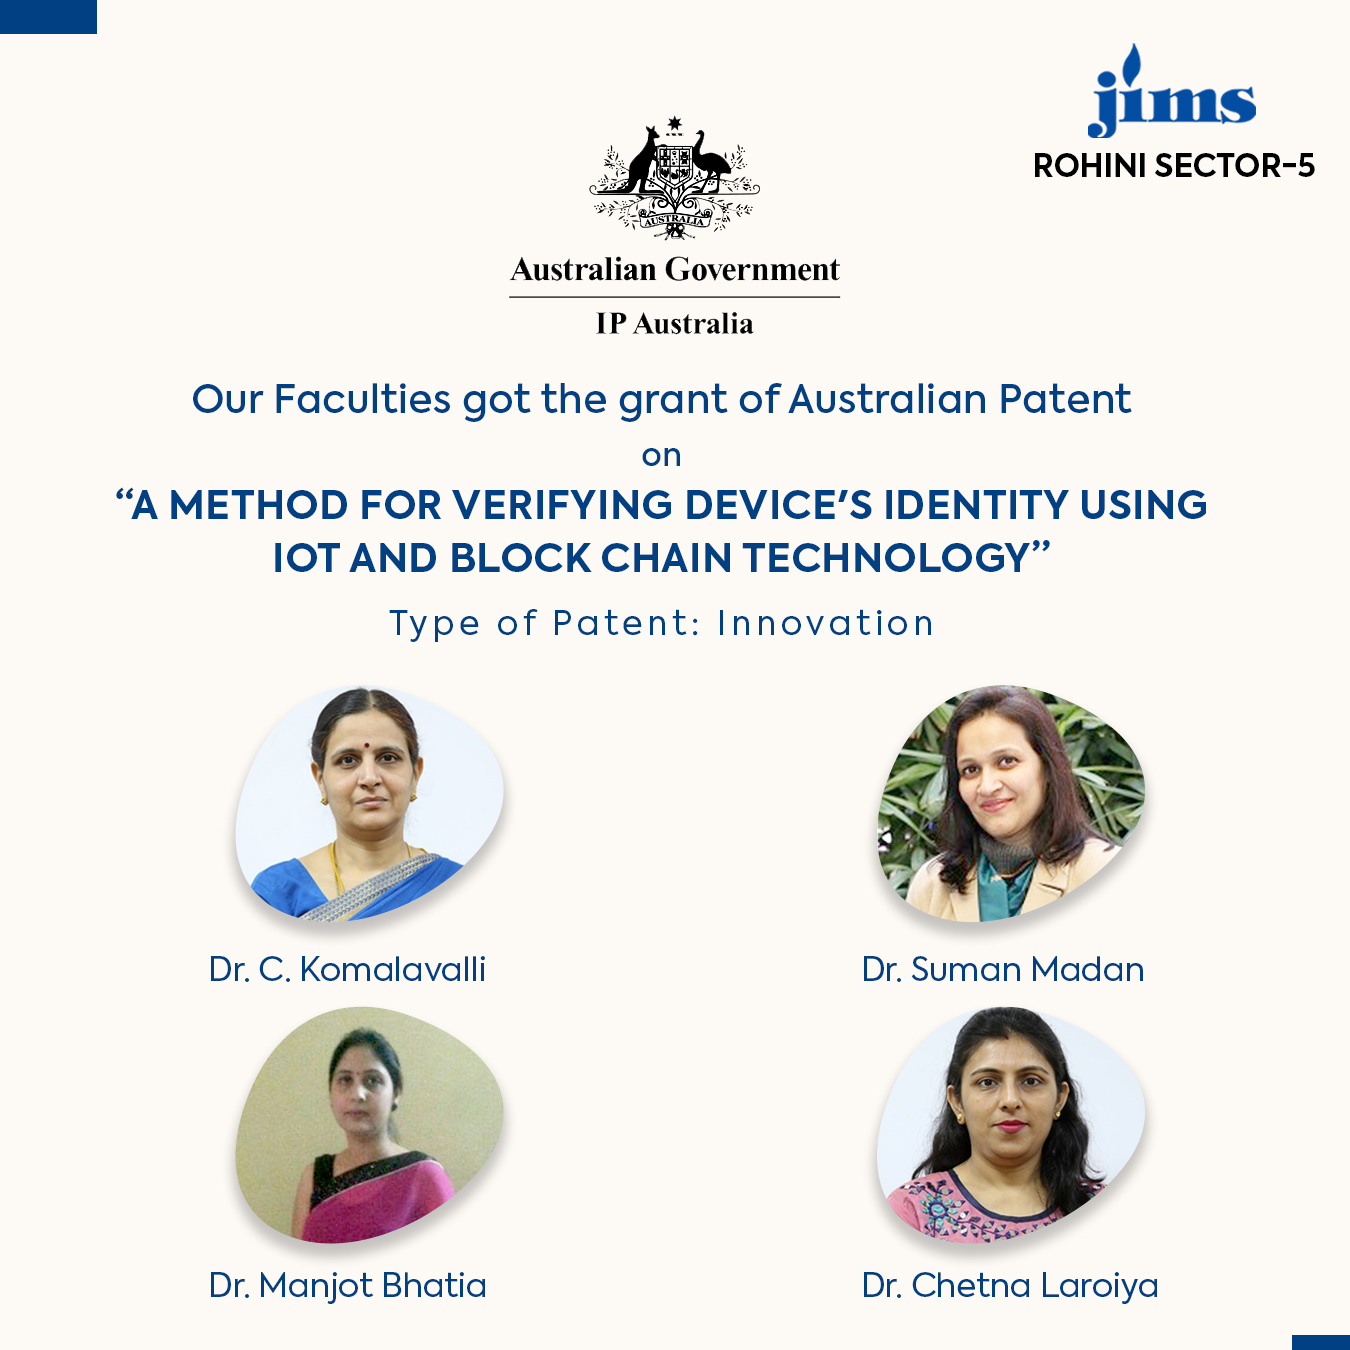 Australian Patent JIMS Rohini